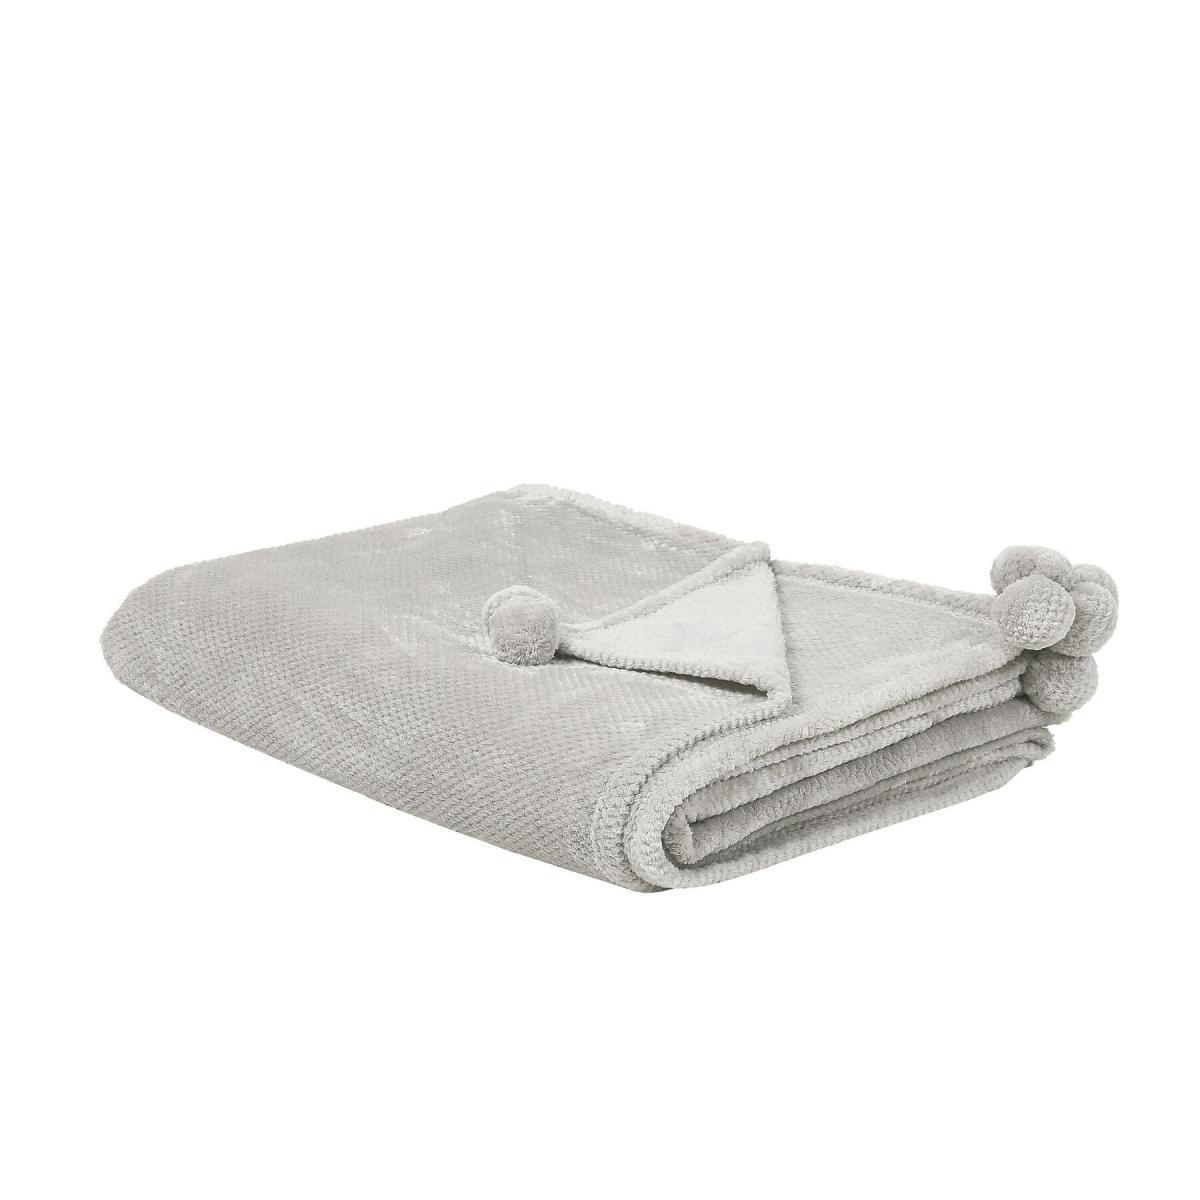 Beliani Beliani Plaid gris clair 200 x 220 cm SAITLER - gris clair